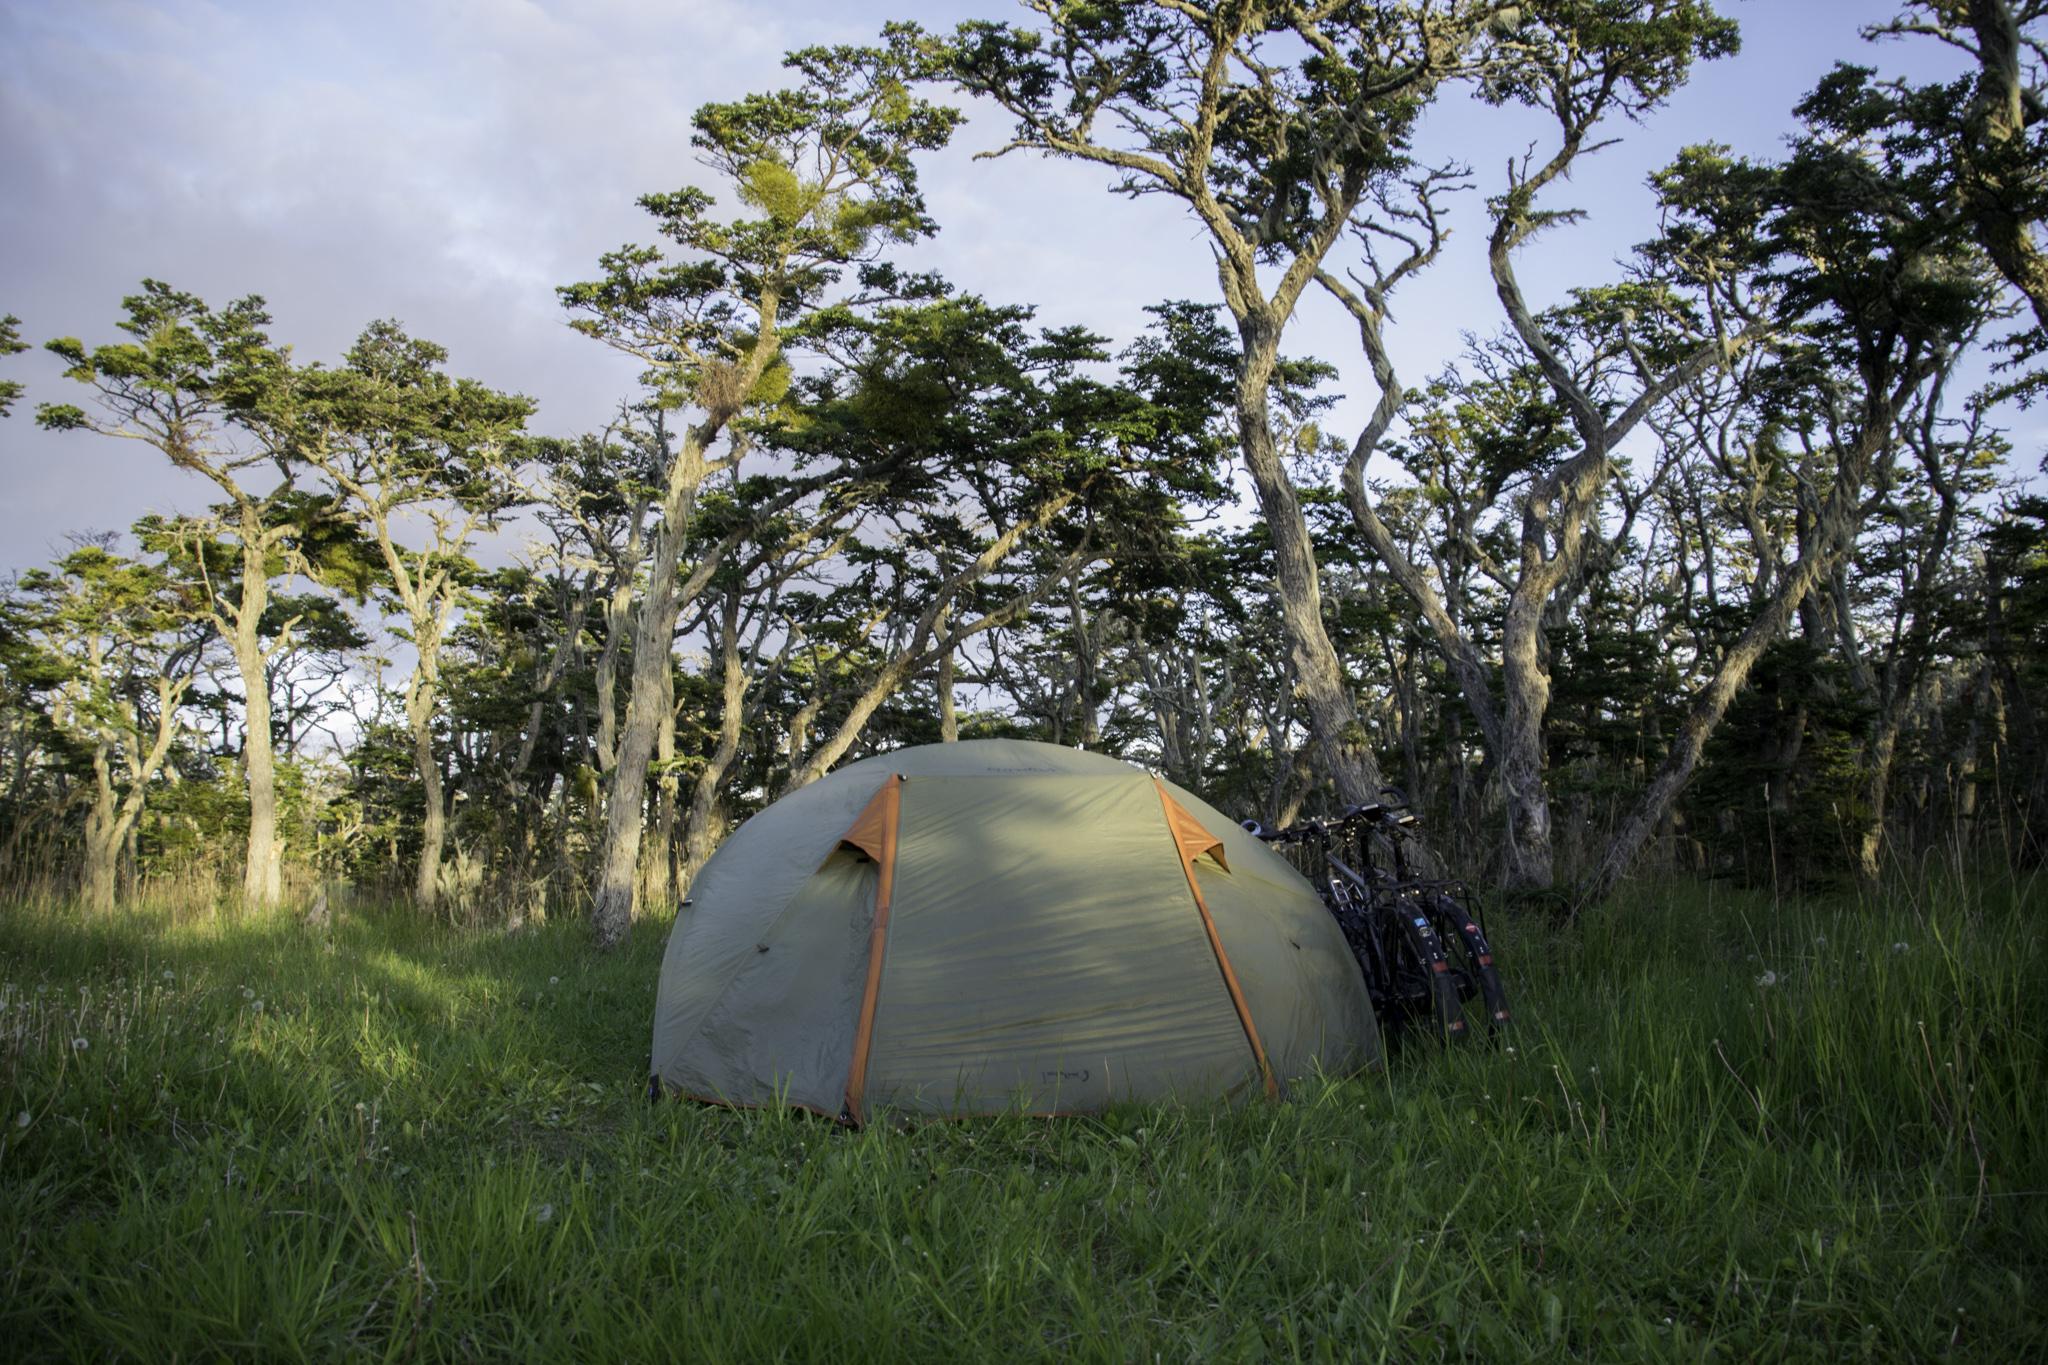 Zelten im Windschatten